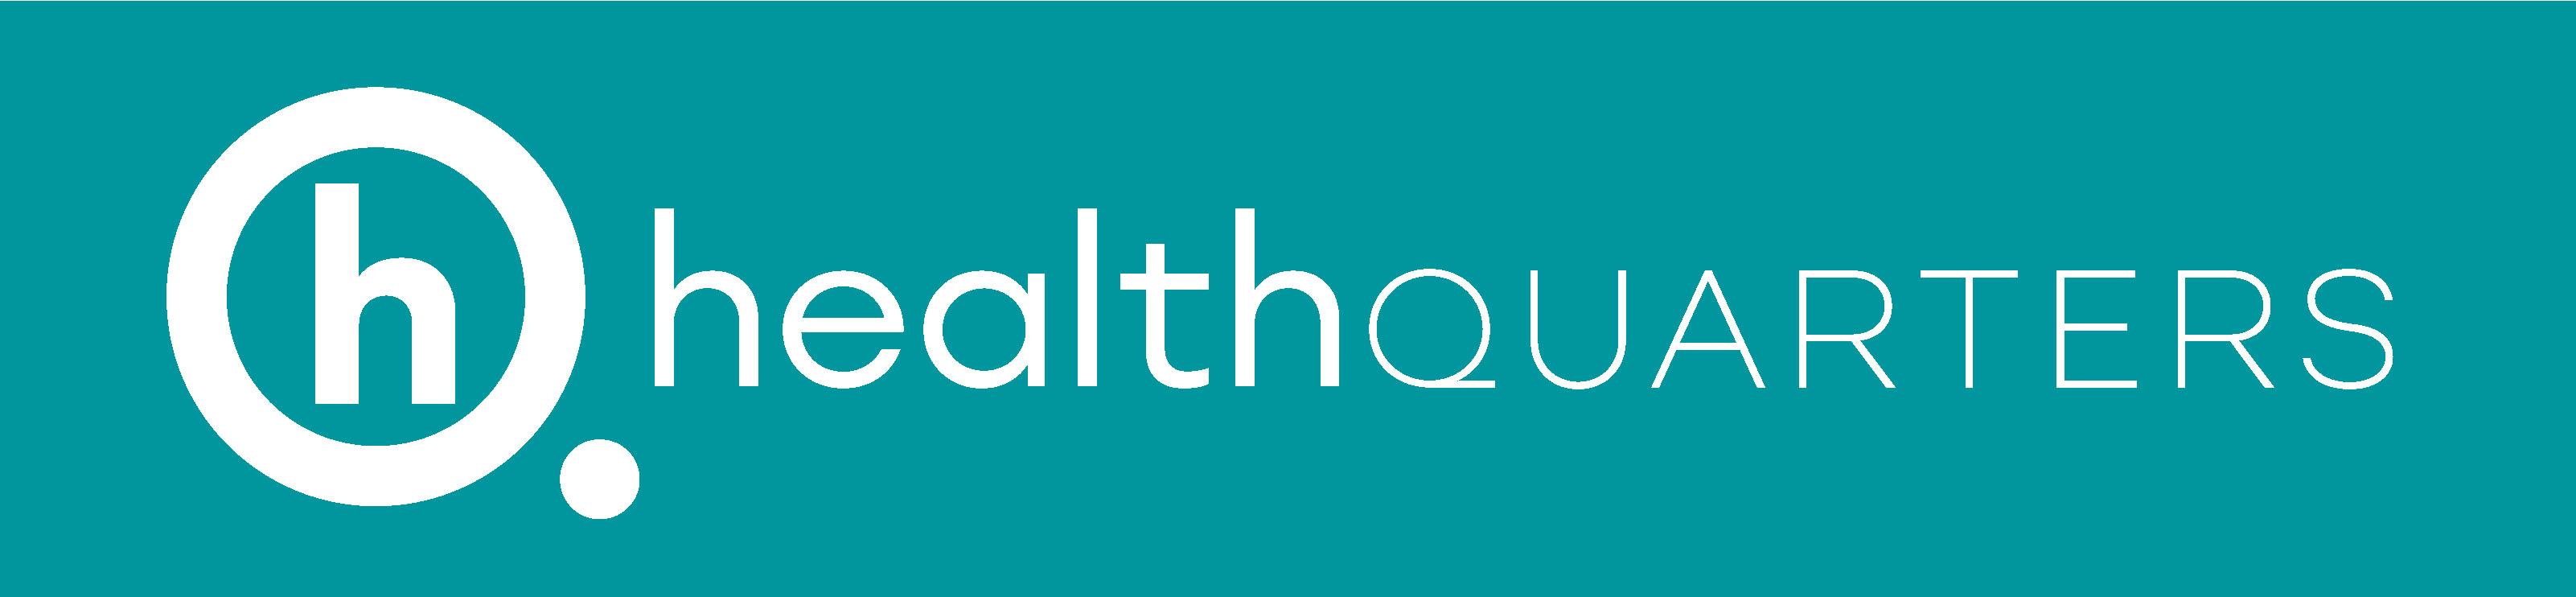 HEALTHQUARTERS